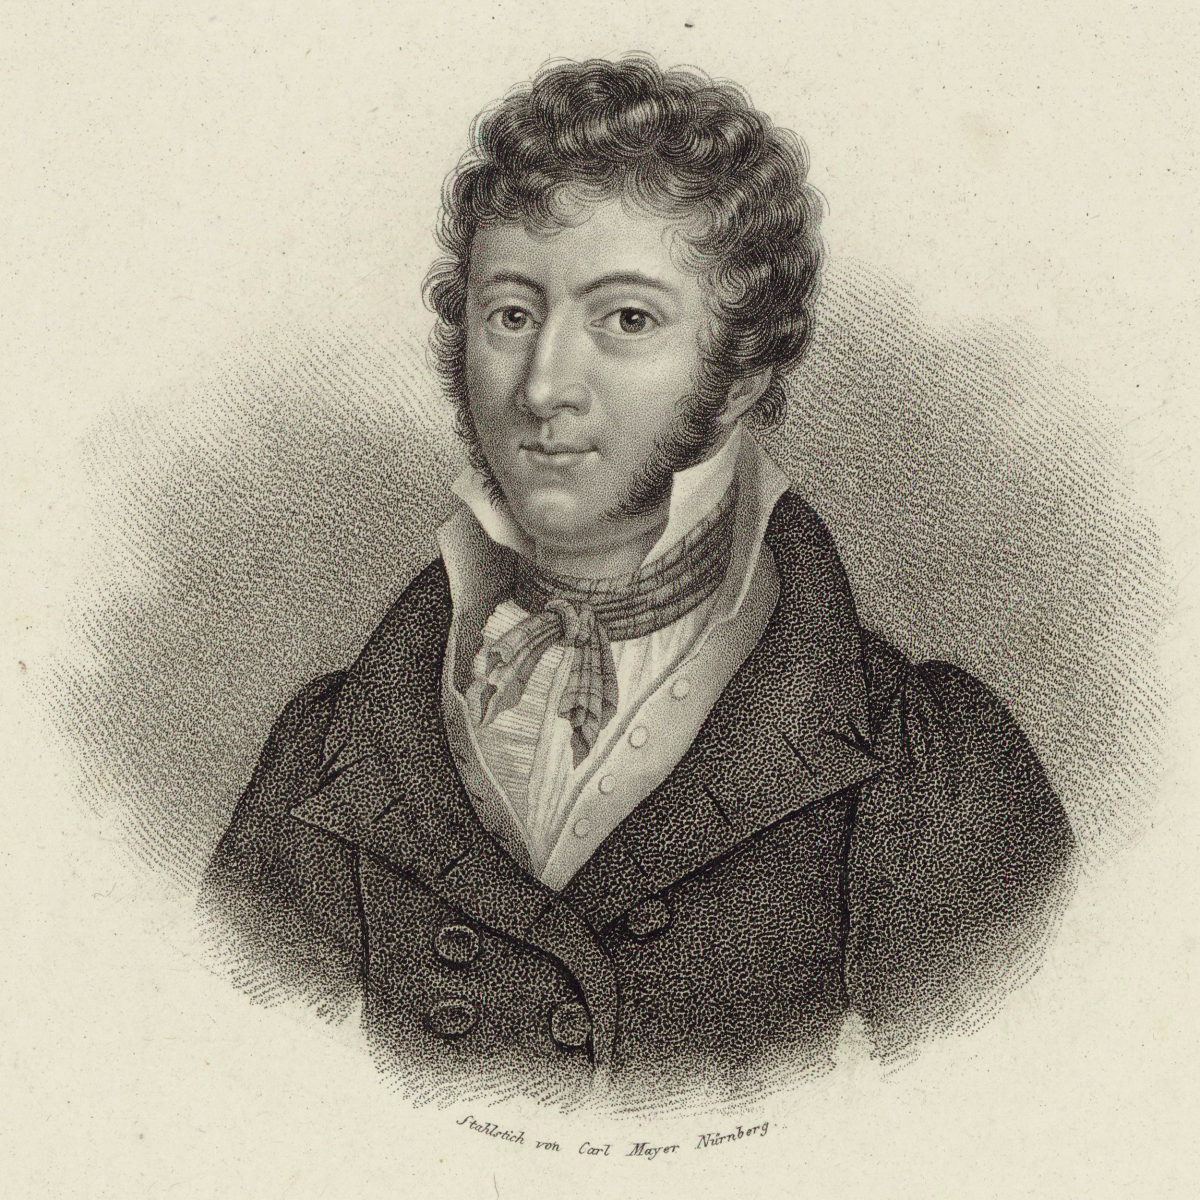 John Field 1782-1837 Sketch of John Field  c1835, held in the archive of Galicia Digital Library.